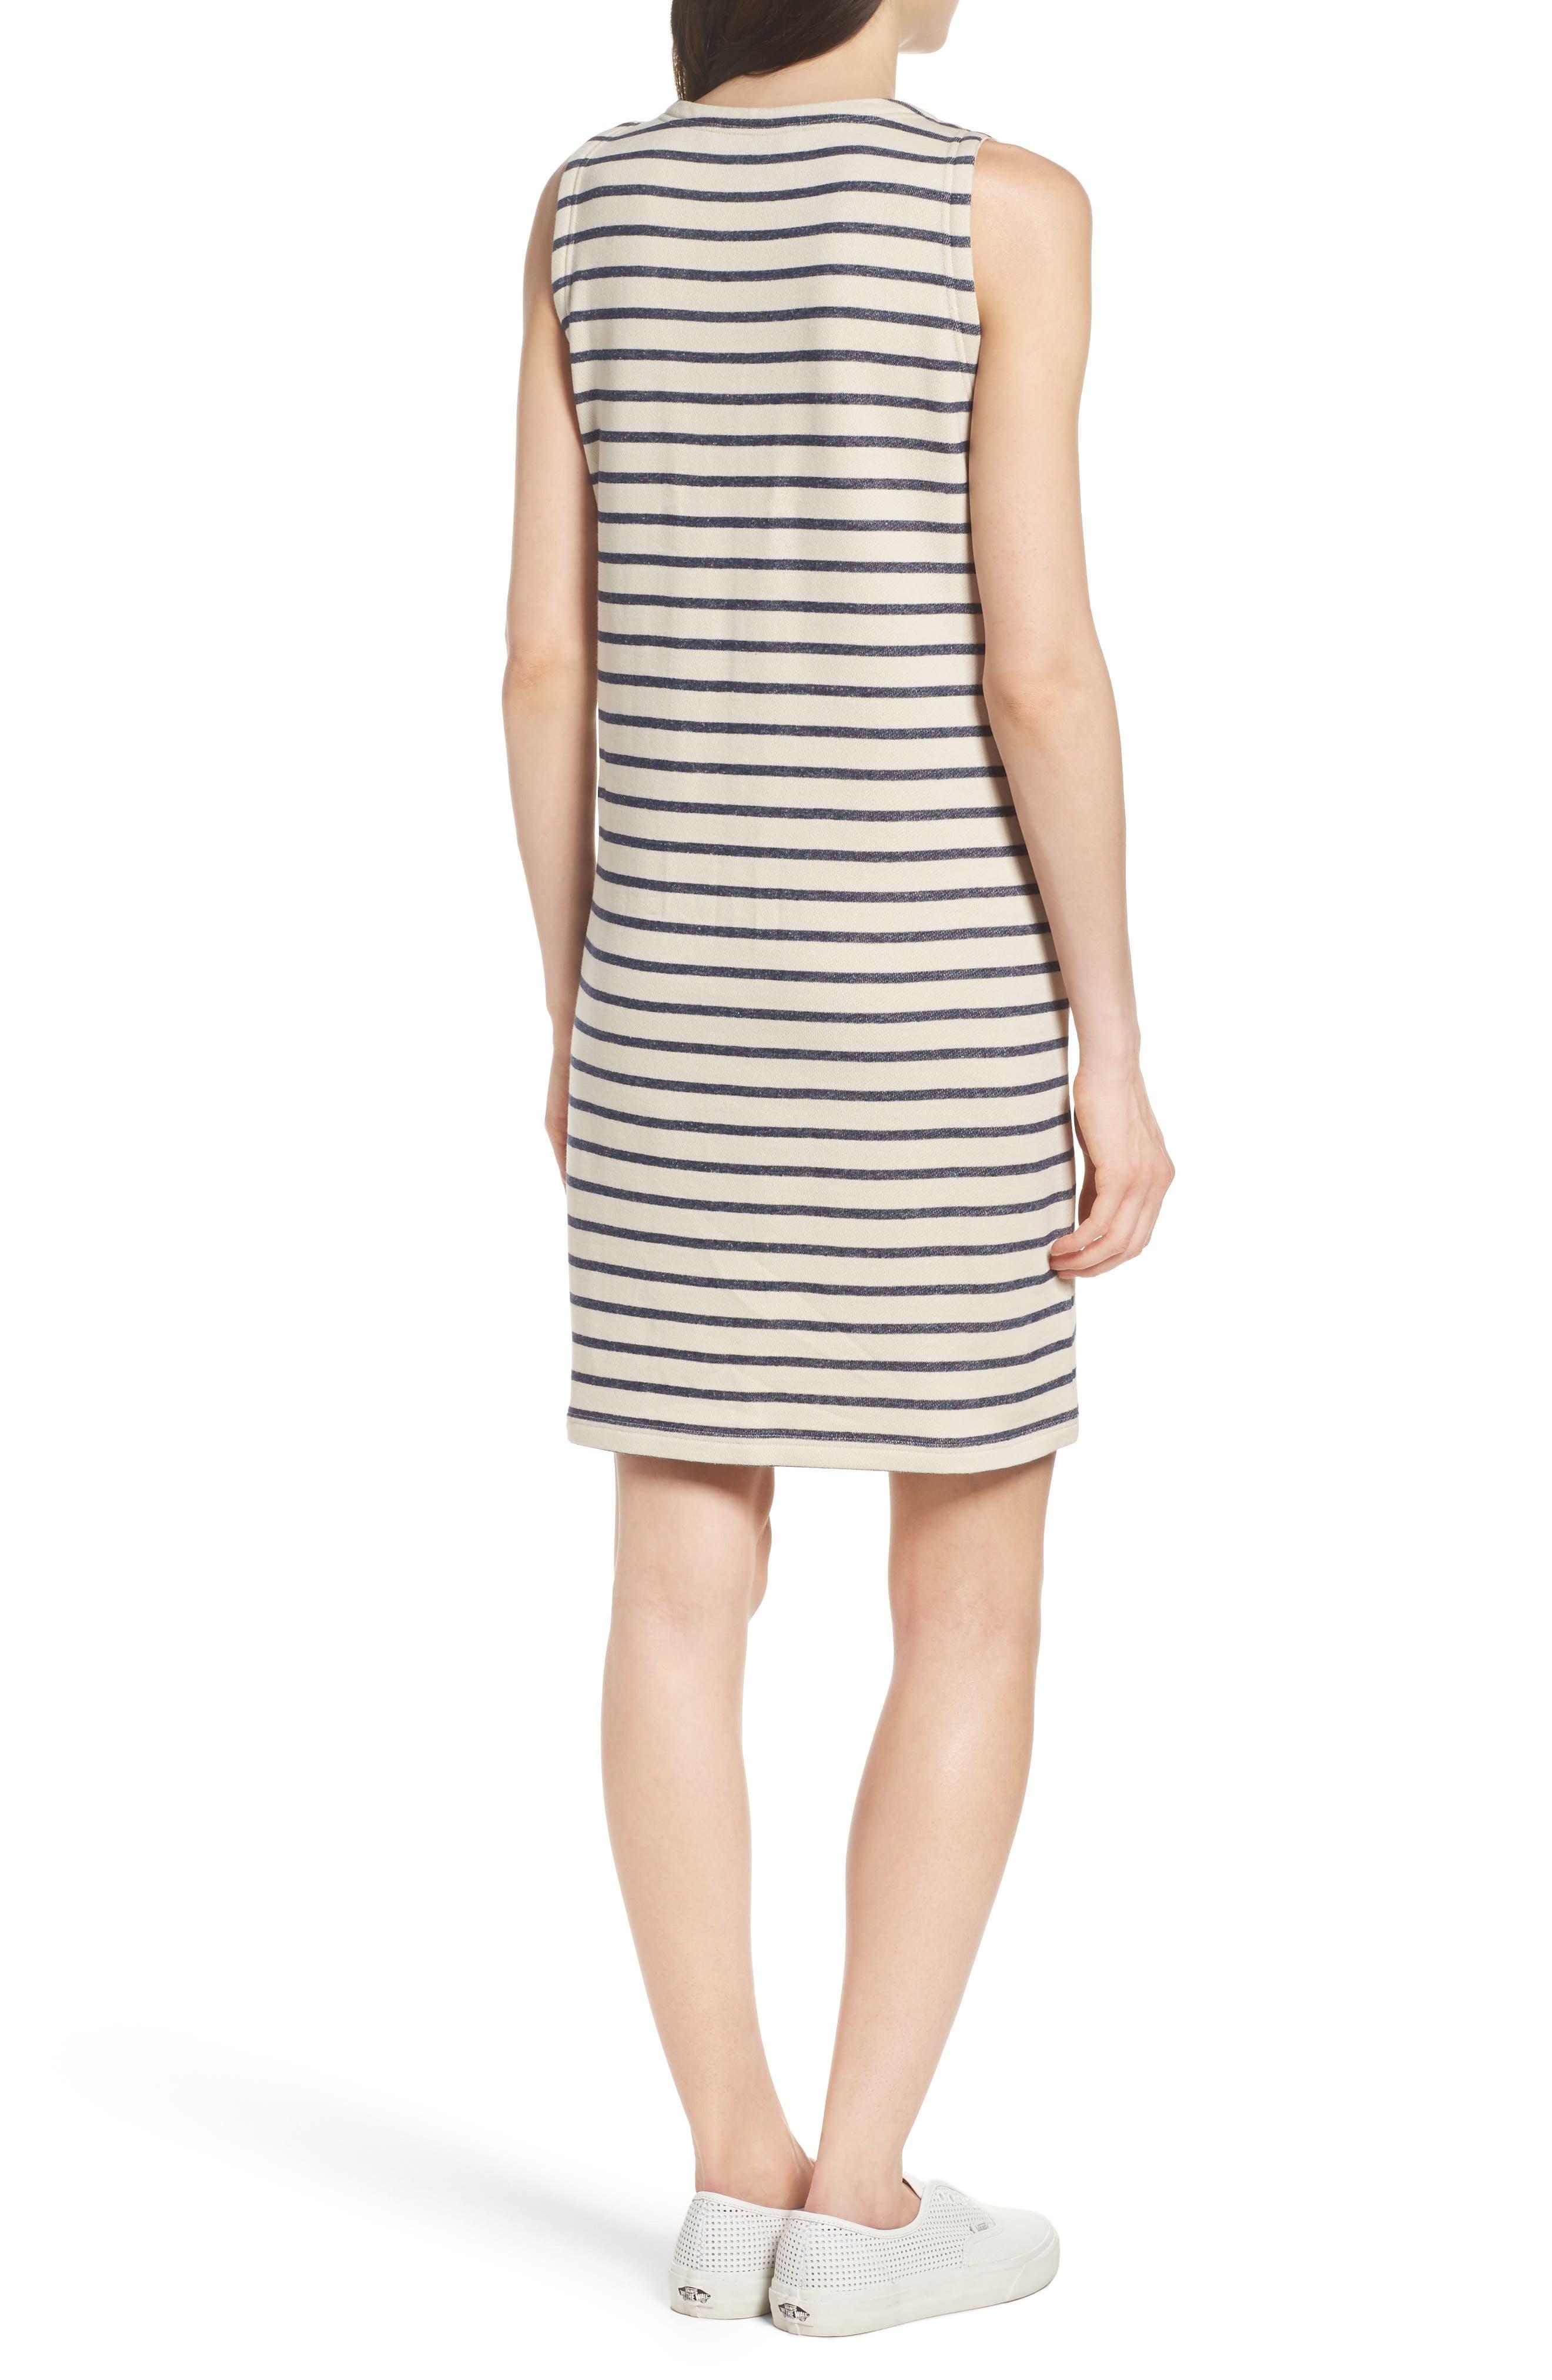 Normandy Stripe Dress,                             Alternate thumbnail 2, color,                             Brule/ Indigo